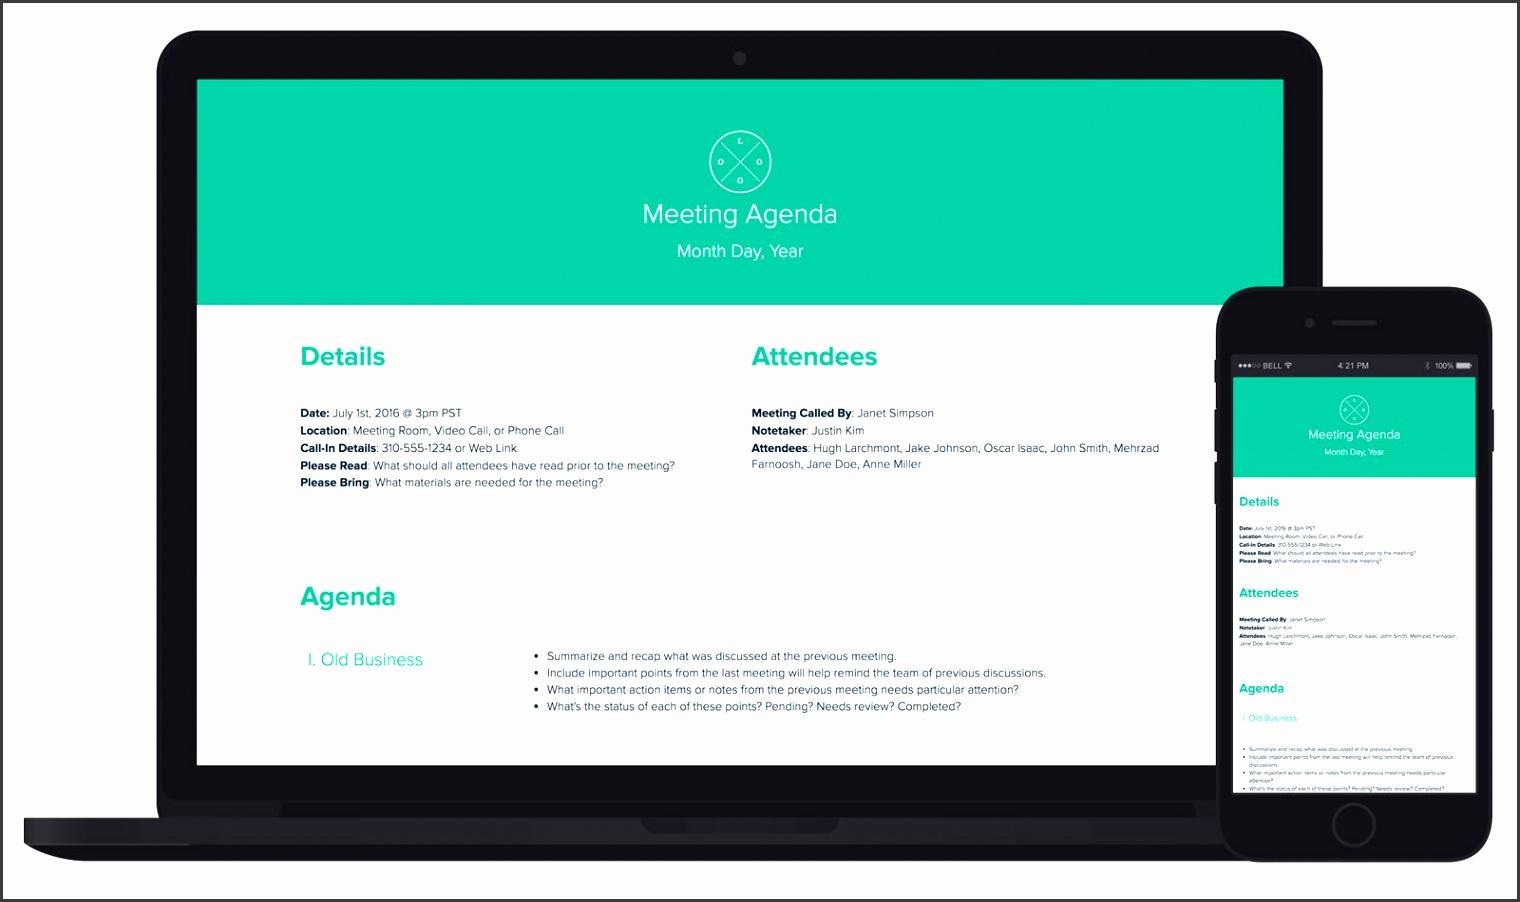 Meeting Agenda by Xtensio